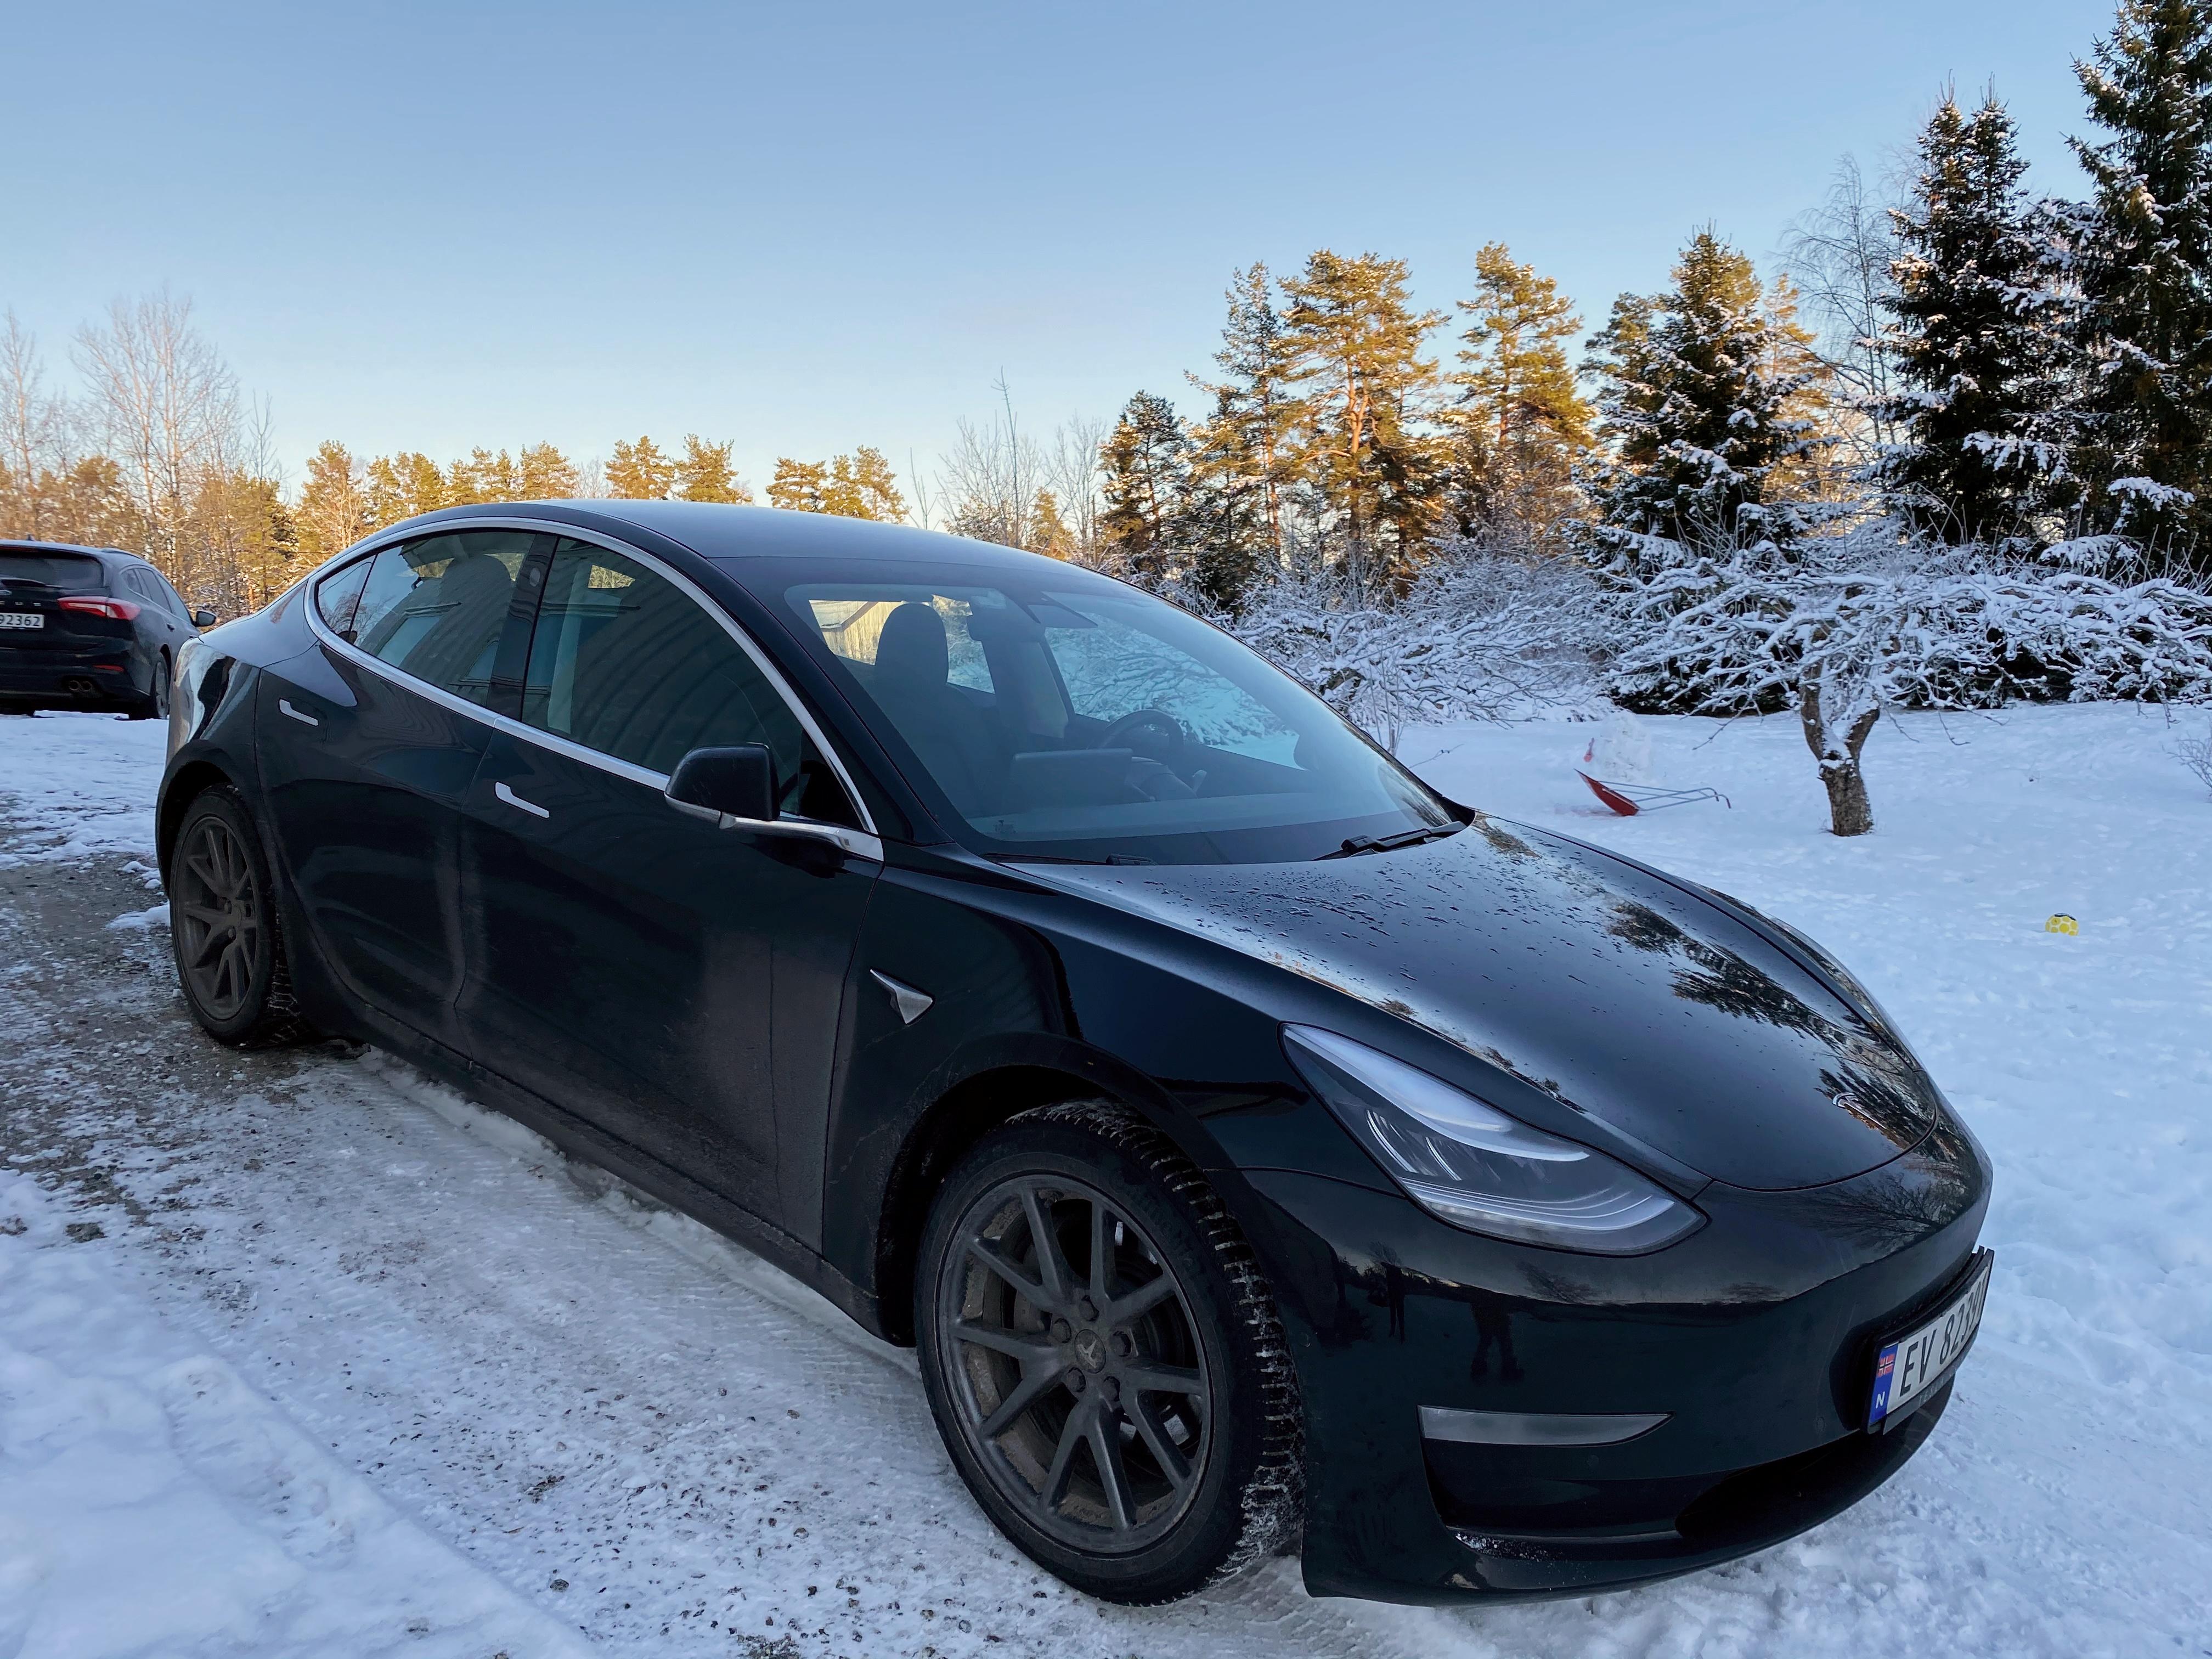 A Tesla car is parked on a driveway in Nesoddtangen, Nesodden municipality, Norway January 4, 2021. REUTERS/Victoria Klesty